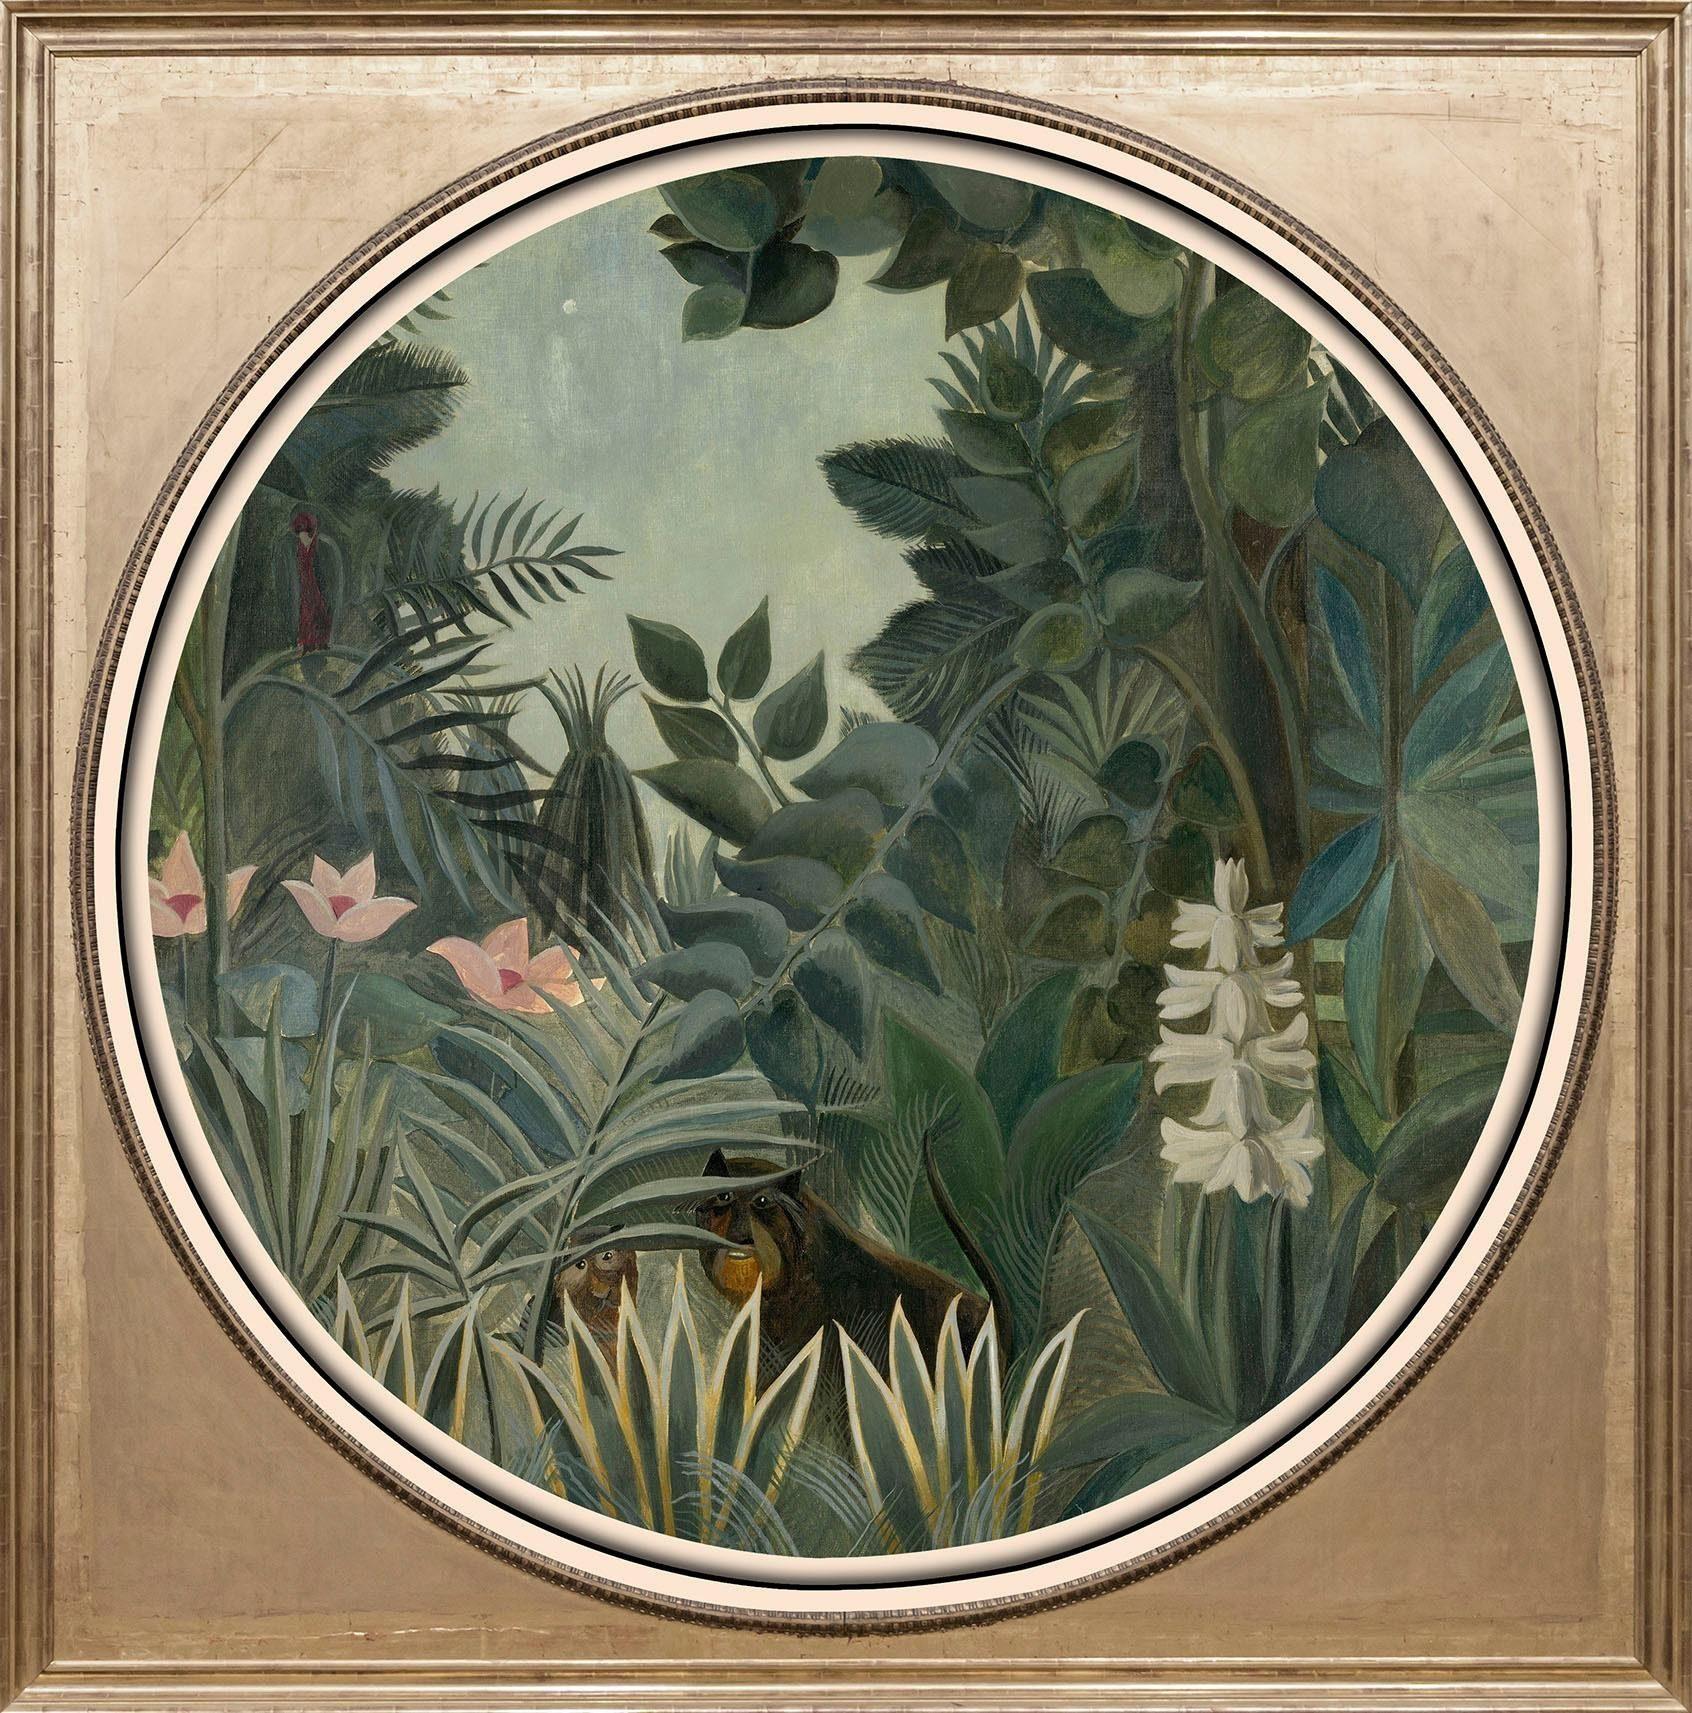 Acrylglasbild »Dschungel«